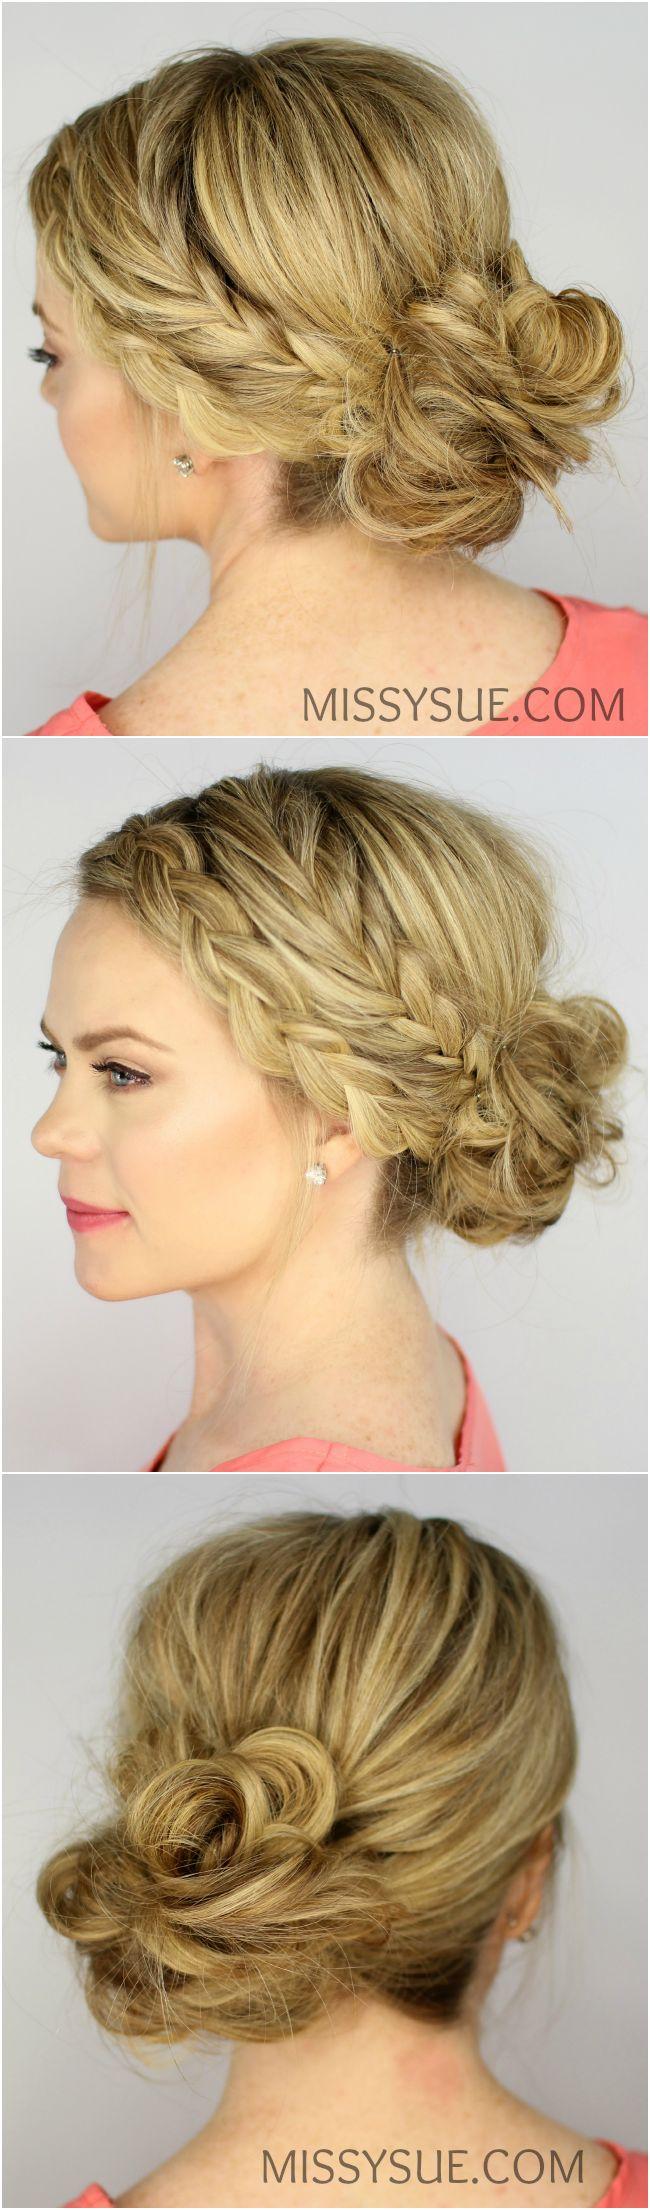 Fishtail and Dutch Braid Messy Bun | Missy Sue